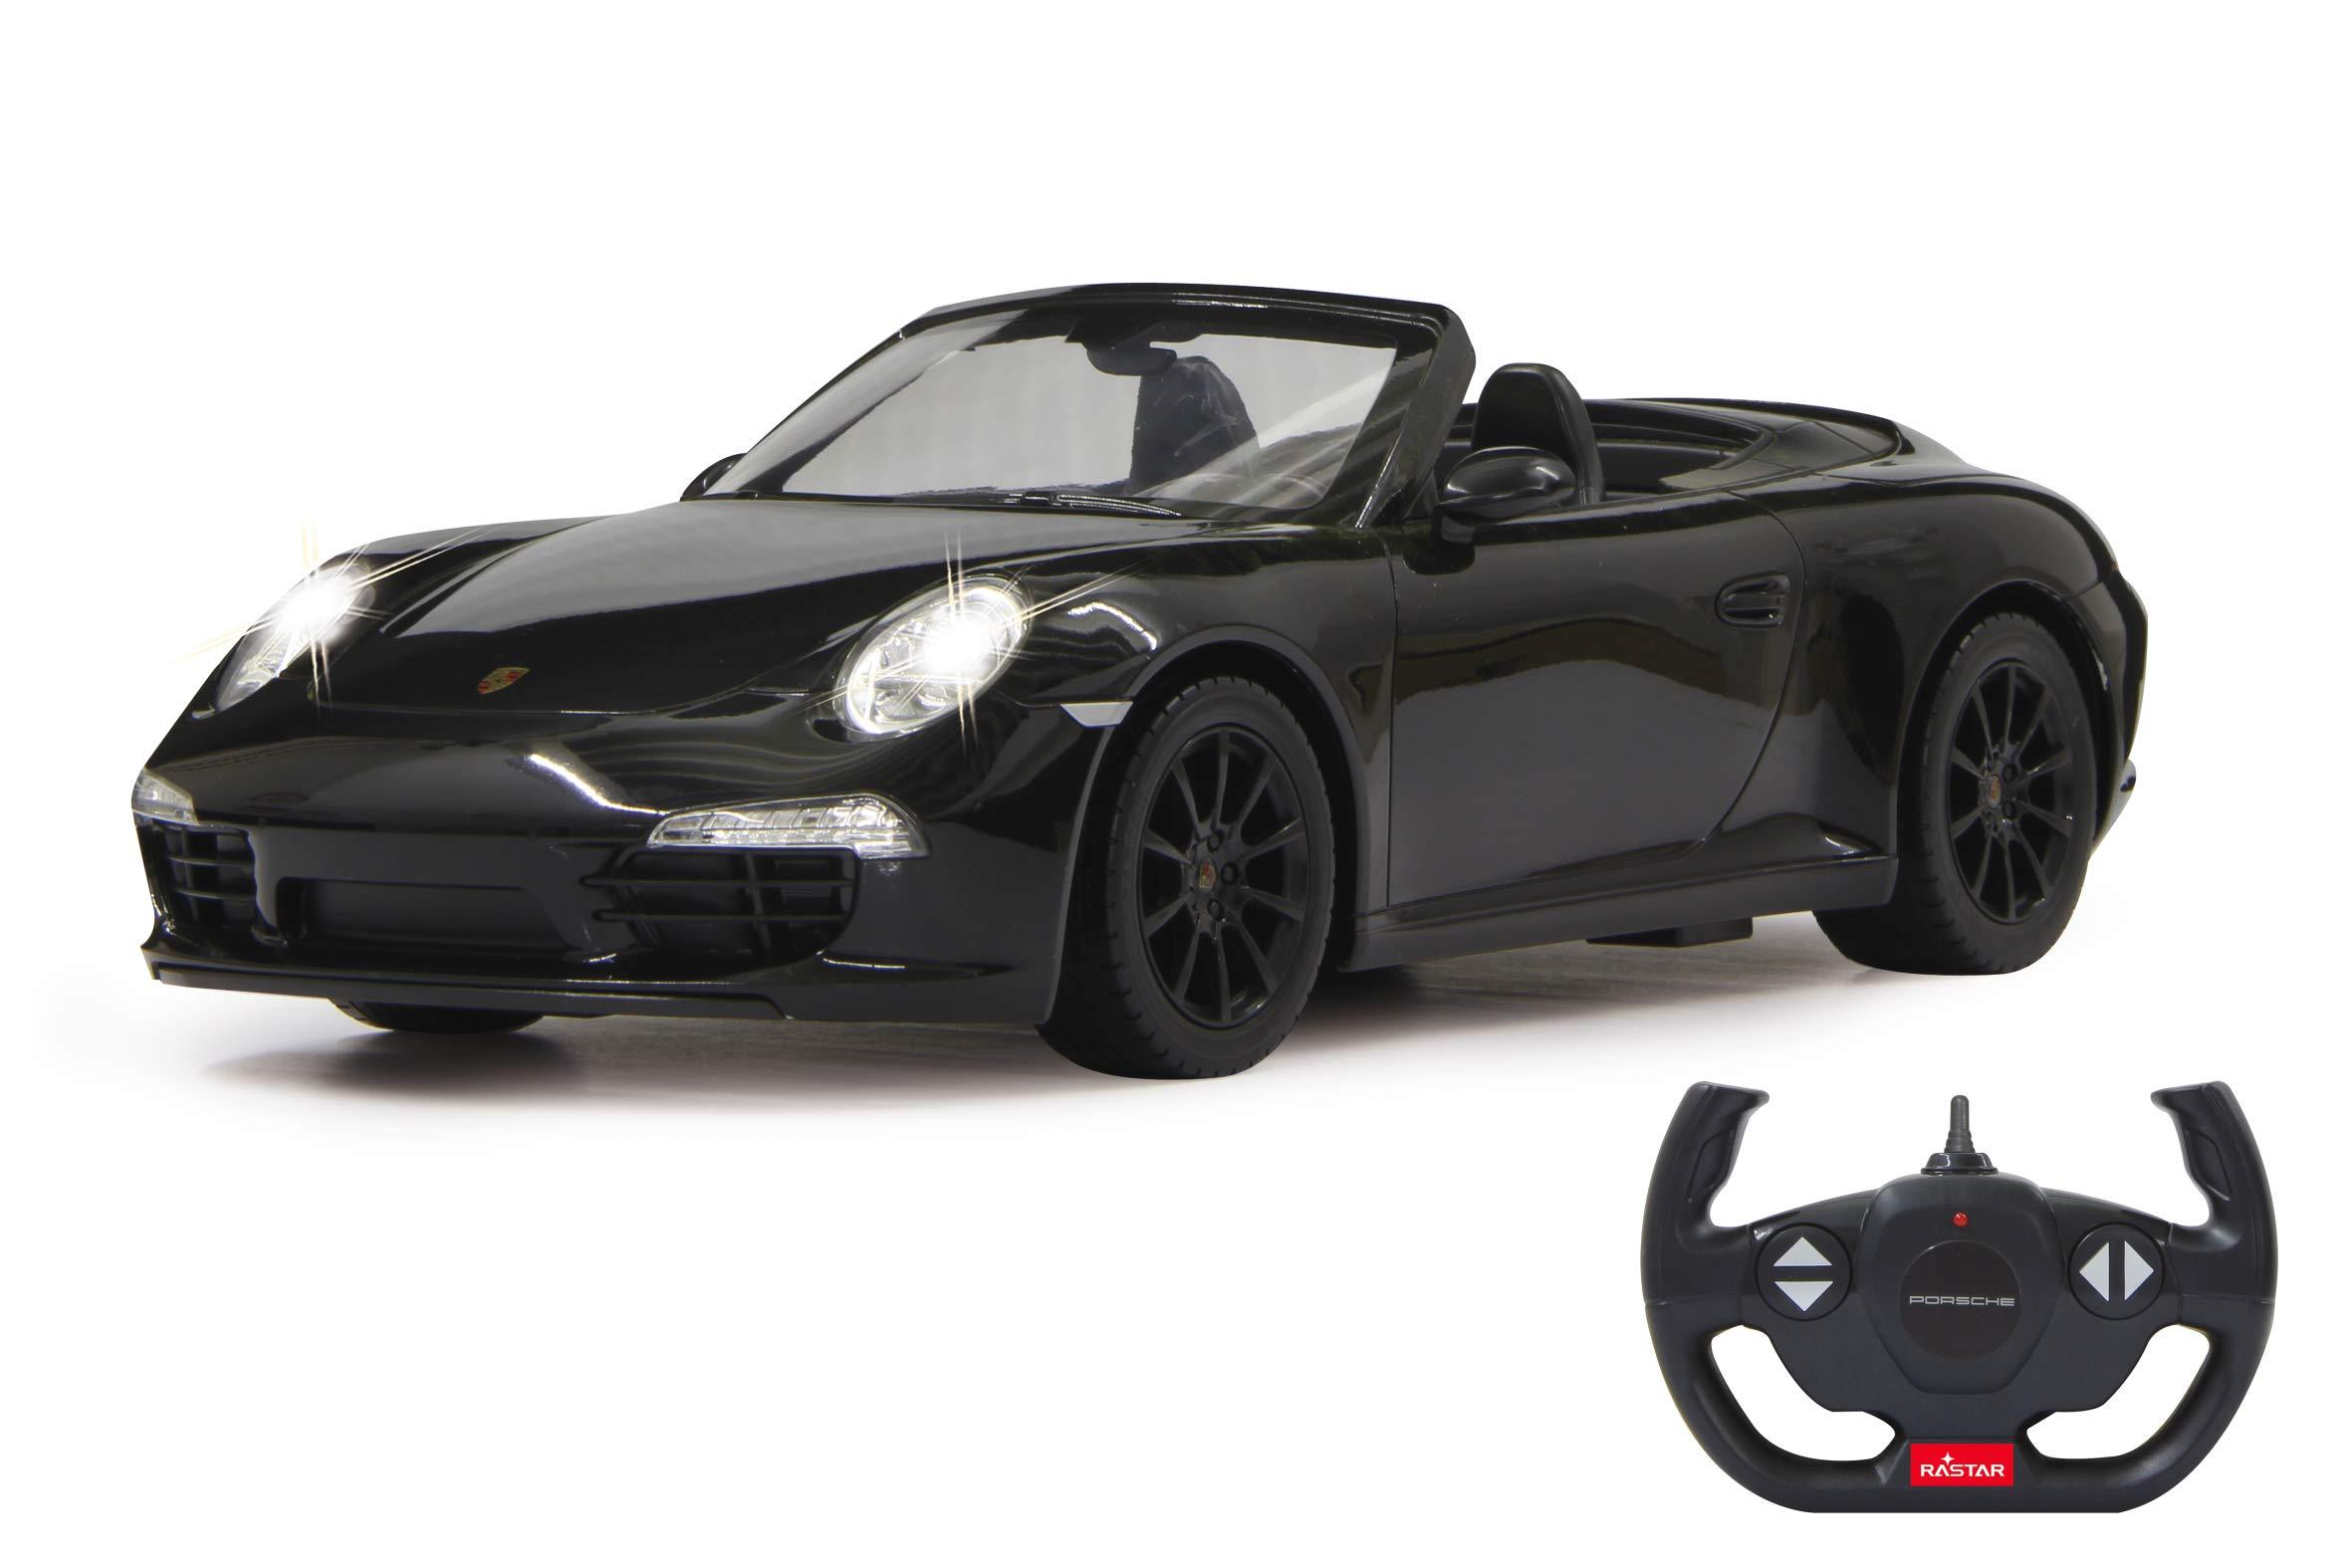 Jamara 403085 1:12 27 MHz Porsche 911 Carrera S Deluxe Car